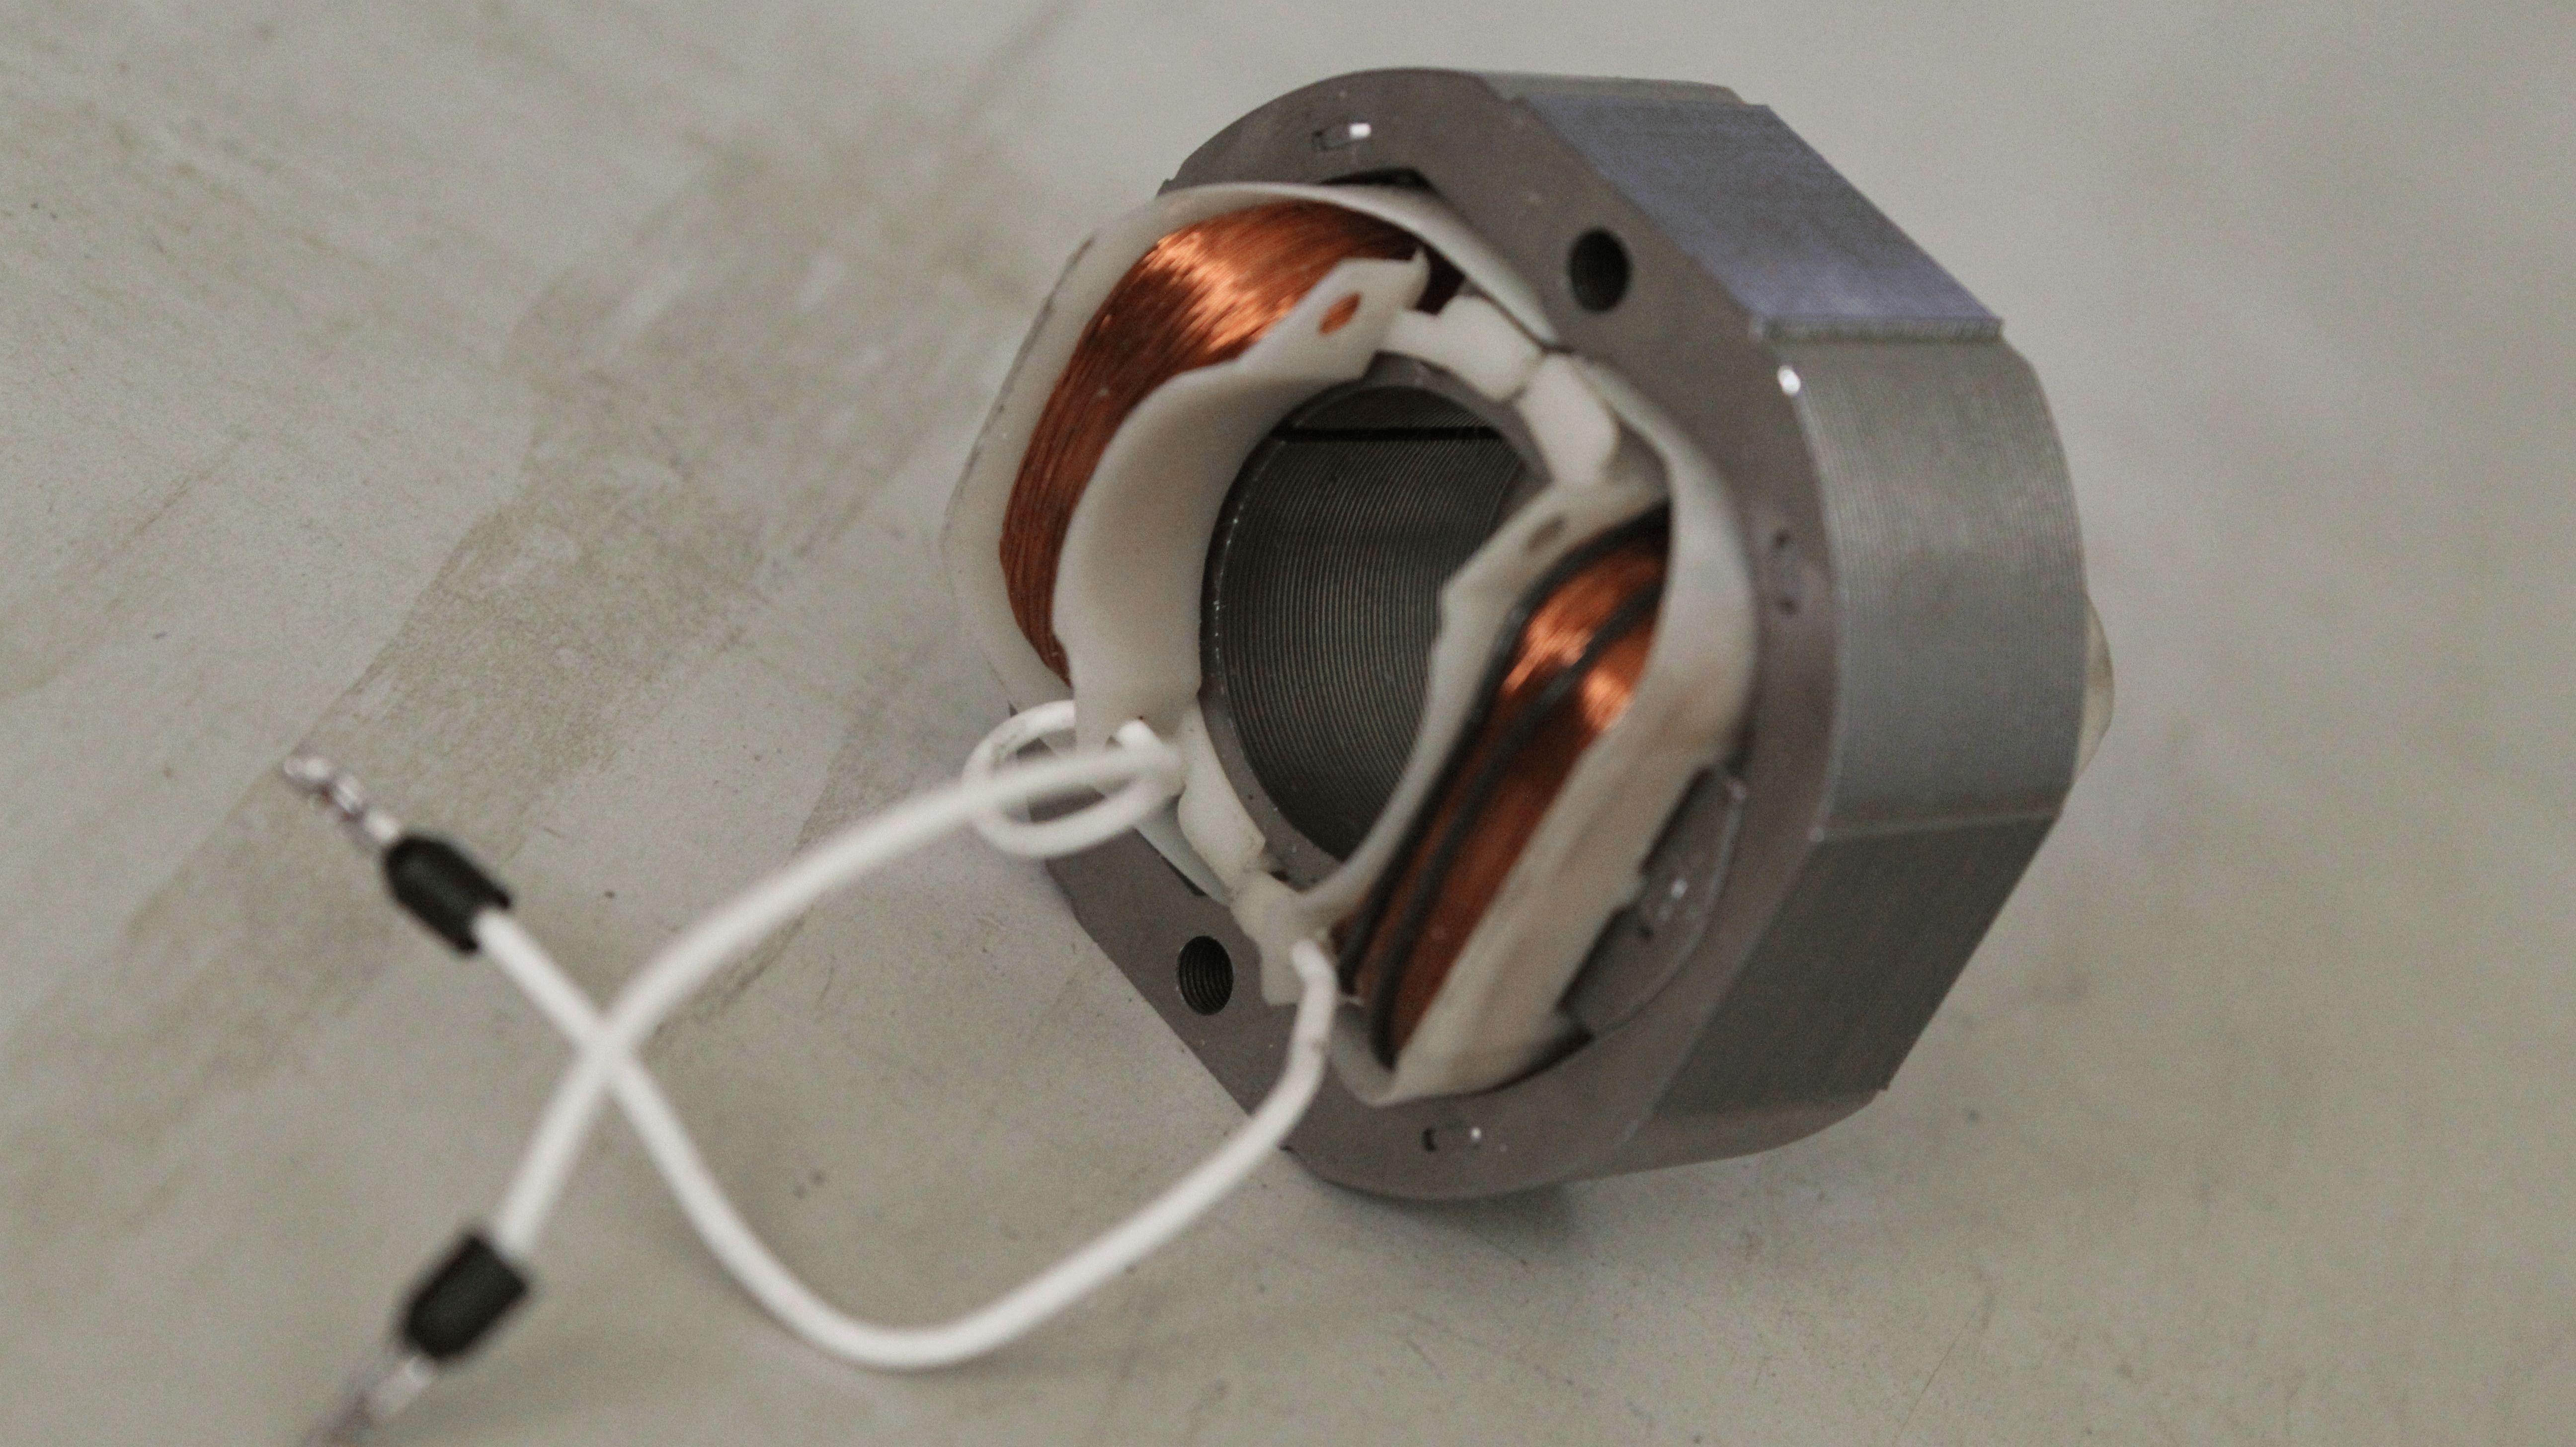 схема намотки однофазного конденсаторного эл.мотора